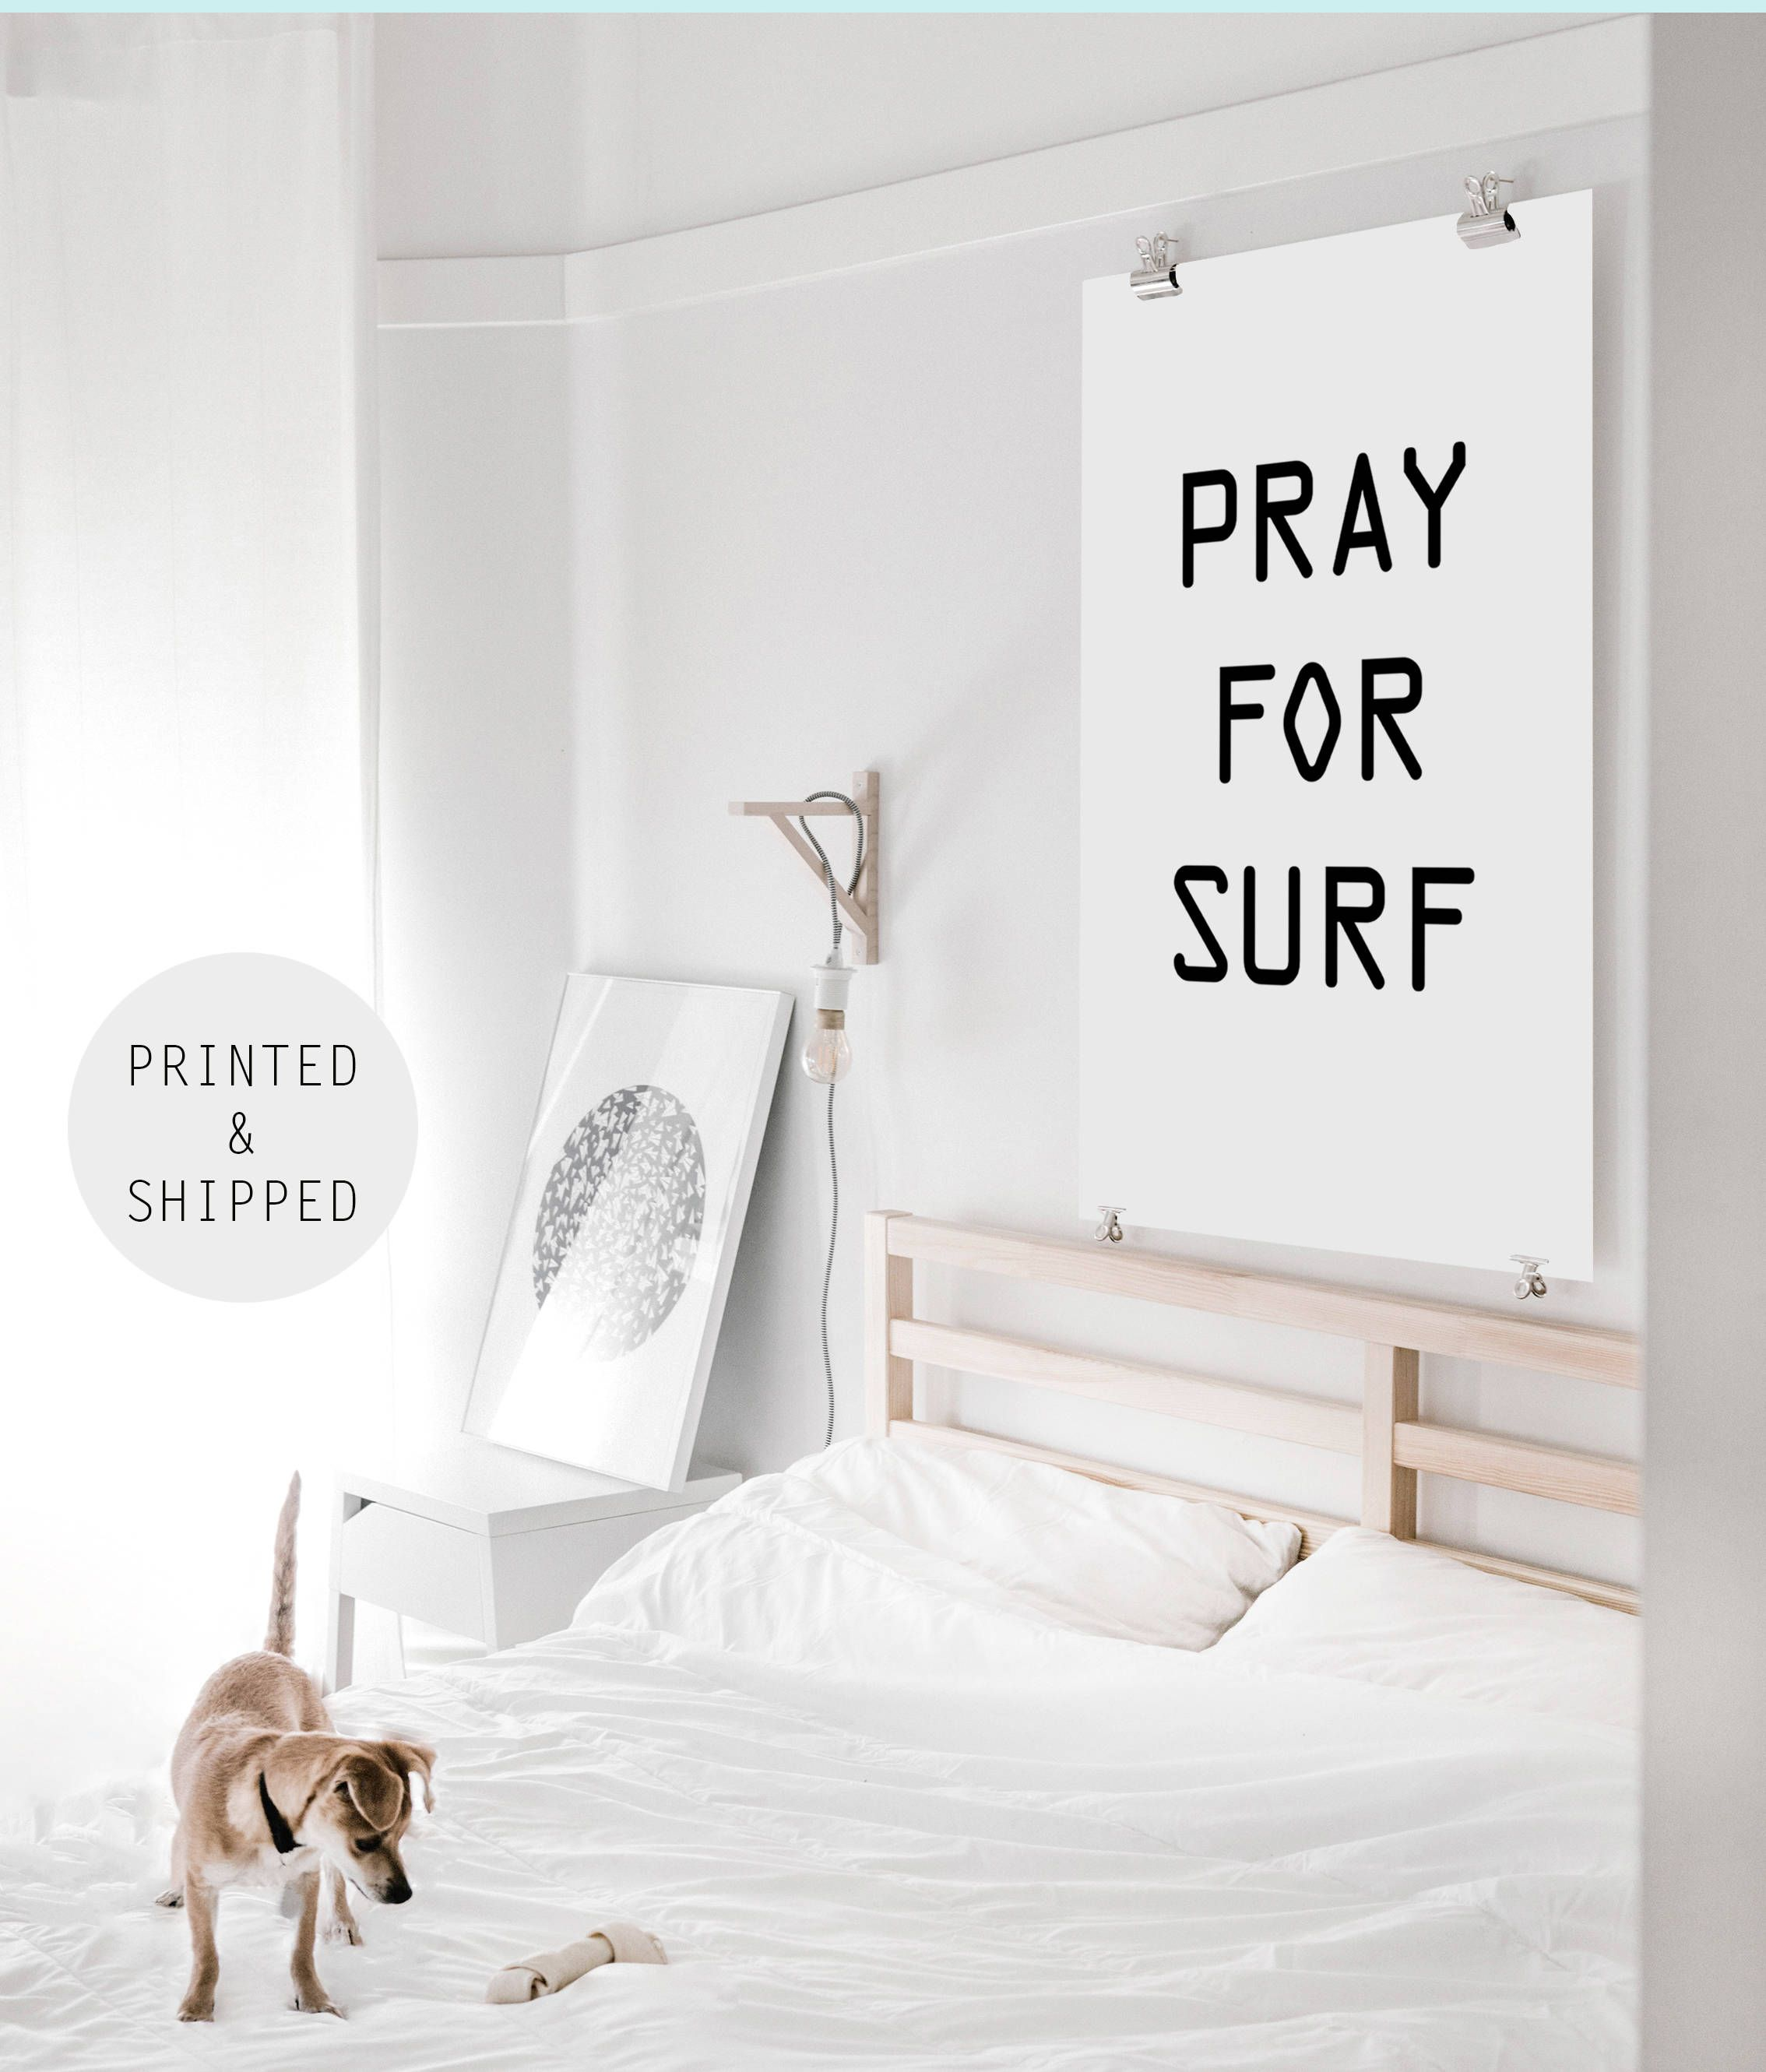 Pray For Surf Print Surf Poster Beach Print Beach Wall Art Large Poster Print 24x36 Surf Saying Print Surf Decor Beach Wall Art Beach Print